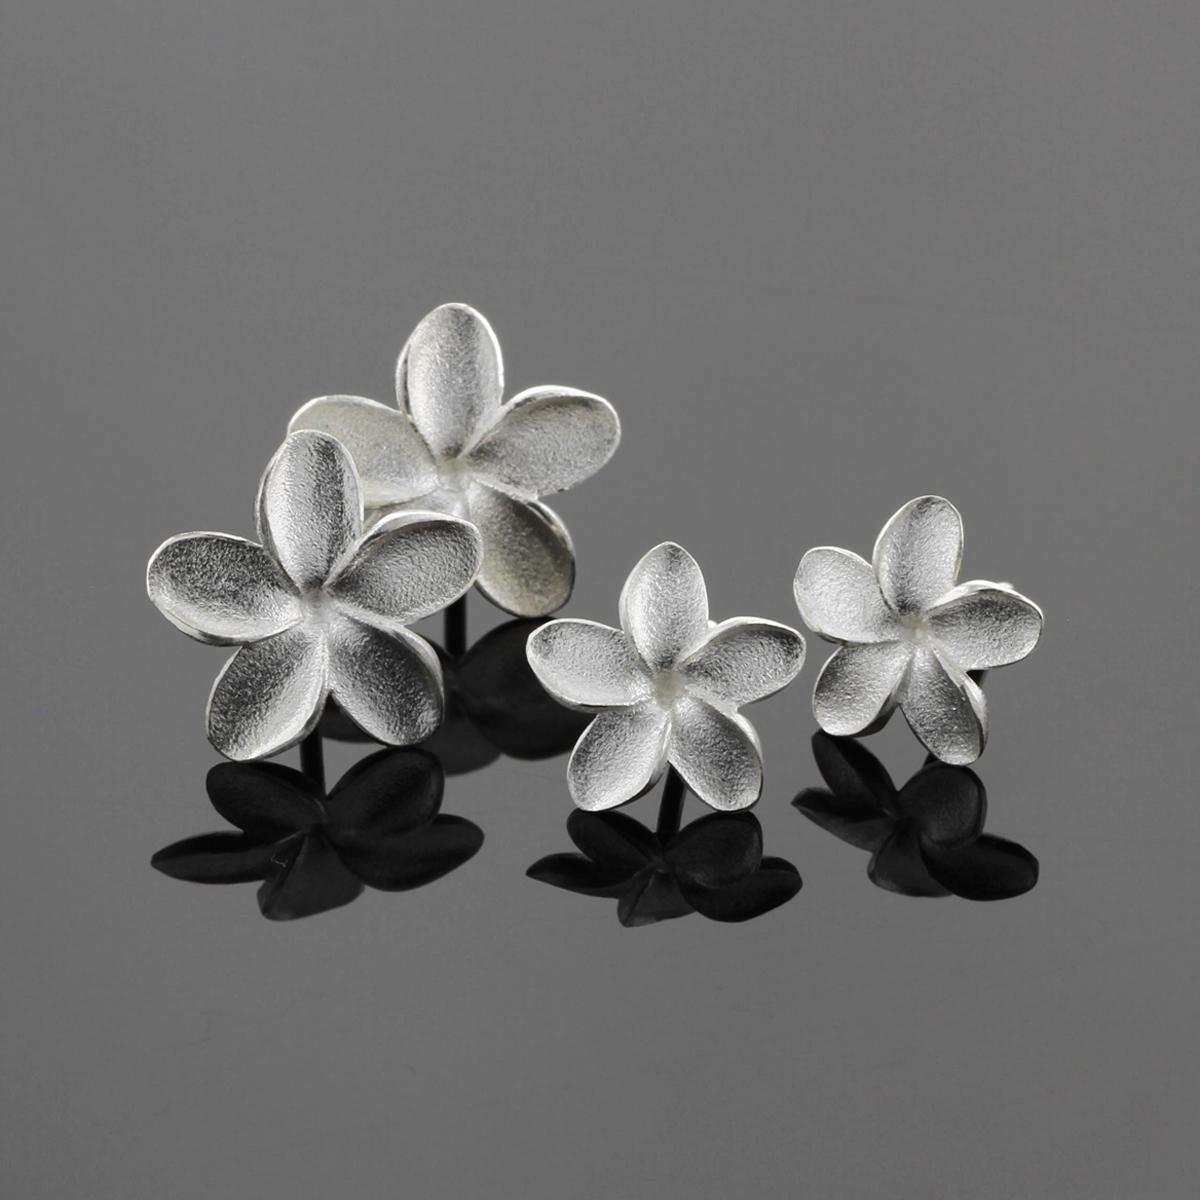 Mauritius silver frangipani earrings